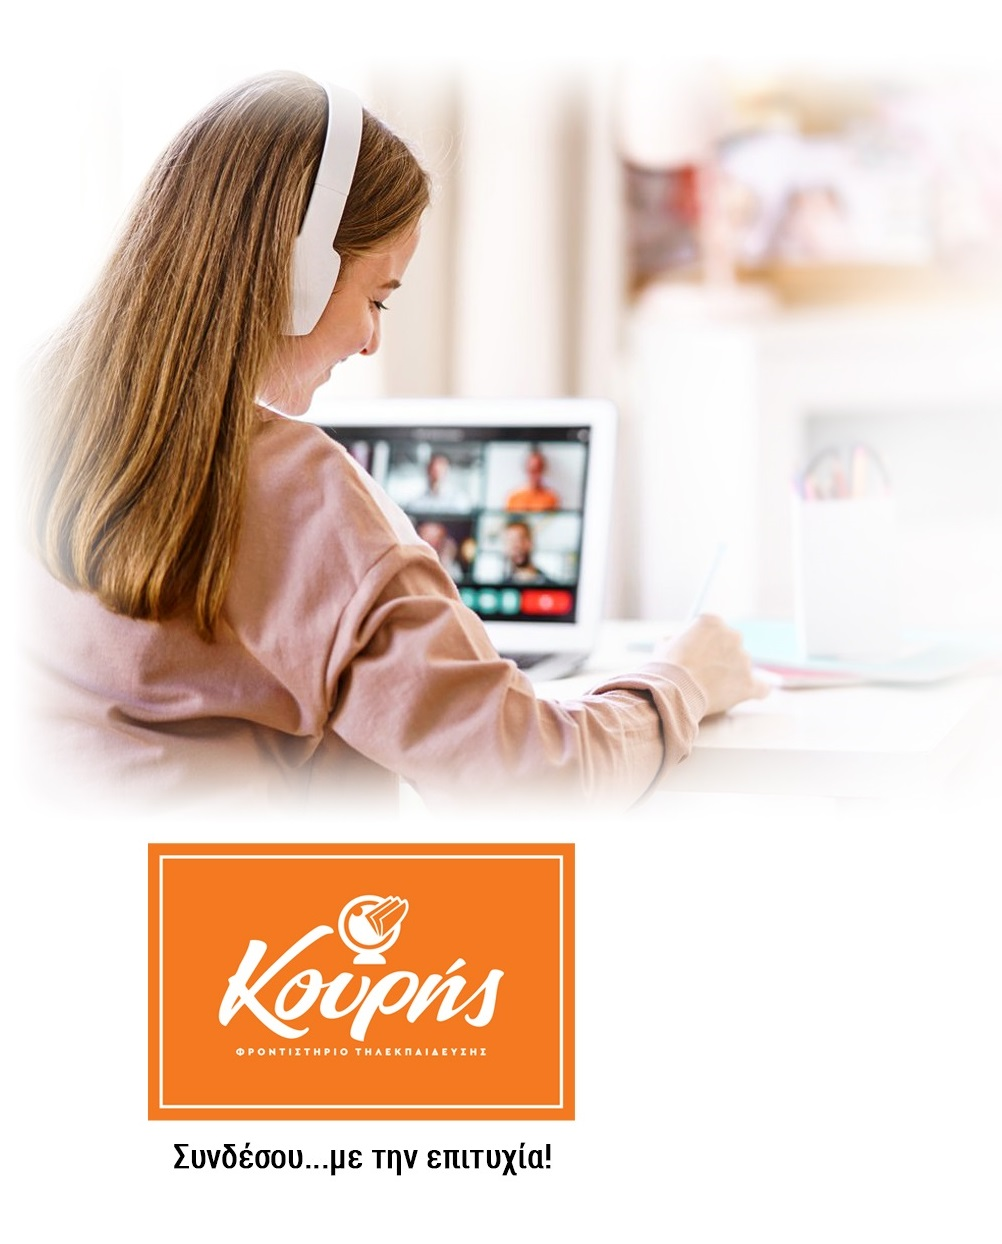 KOURIS-Website_THLEKPAIDEYSH2